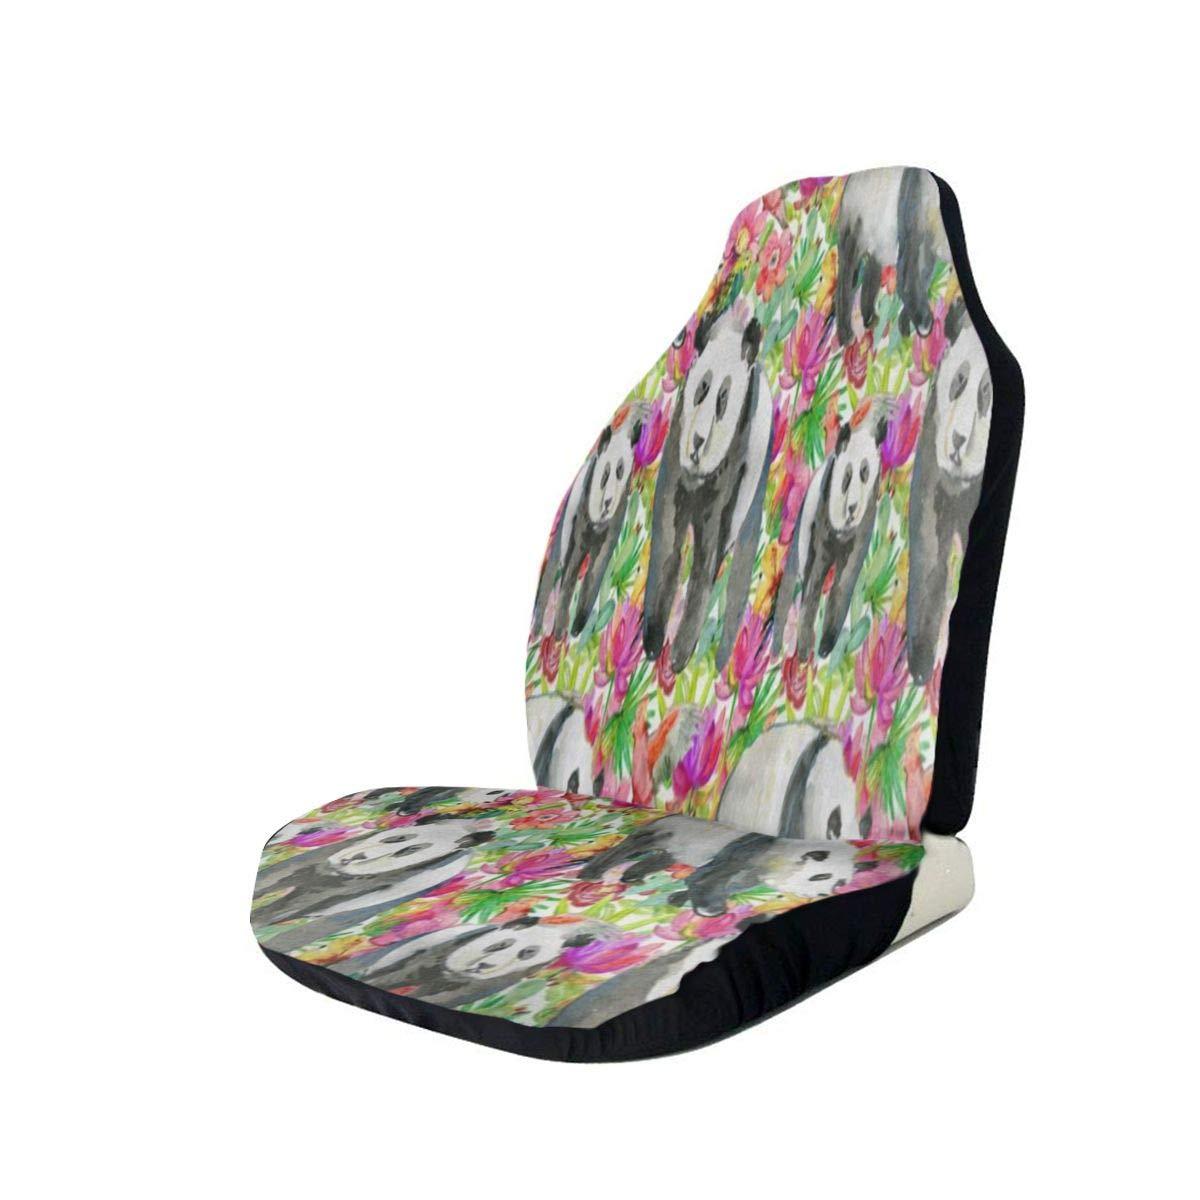 Car Seat Covers Watercolor Floral Panda Animal Best Automobile Seats Protector Fit Most Car,Truck,SUV,Van 2PCS